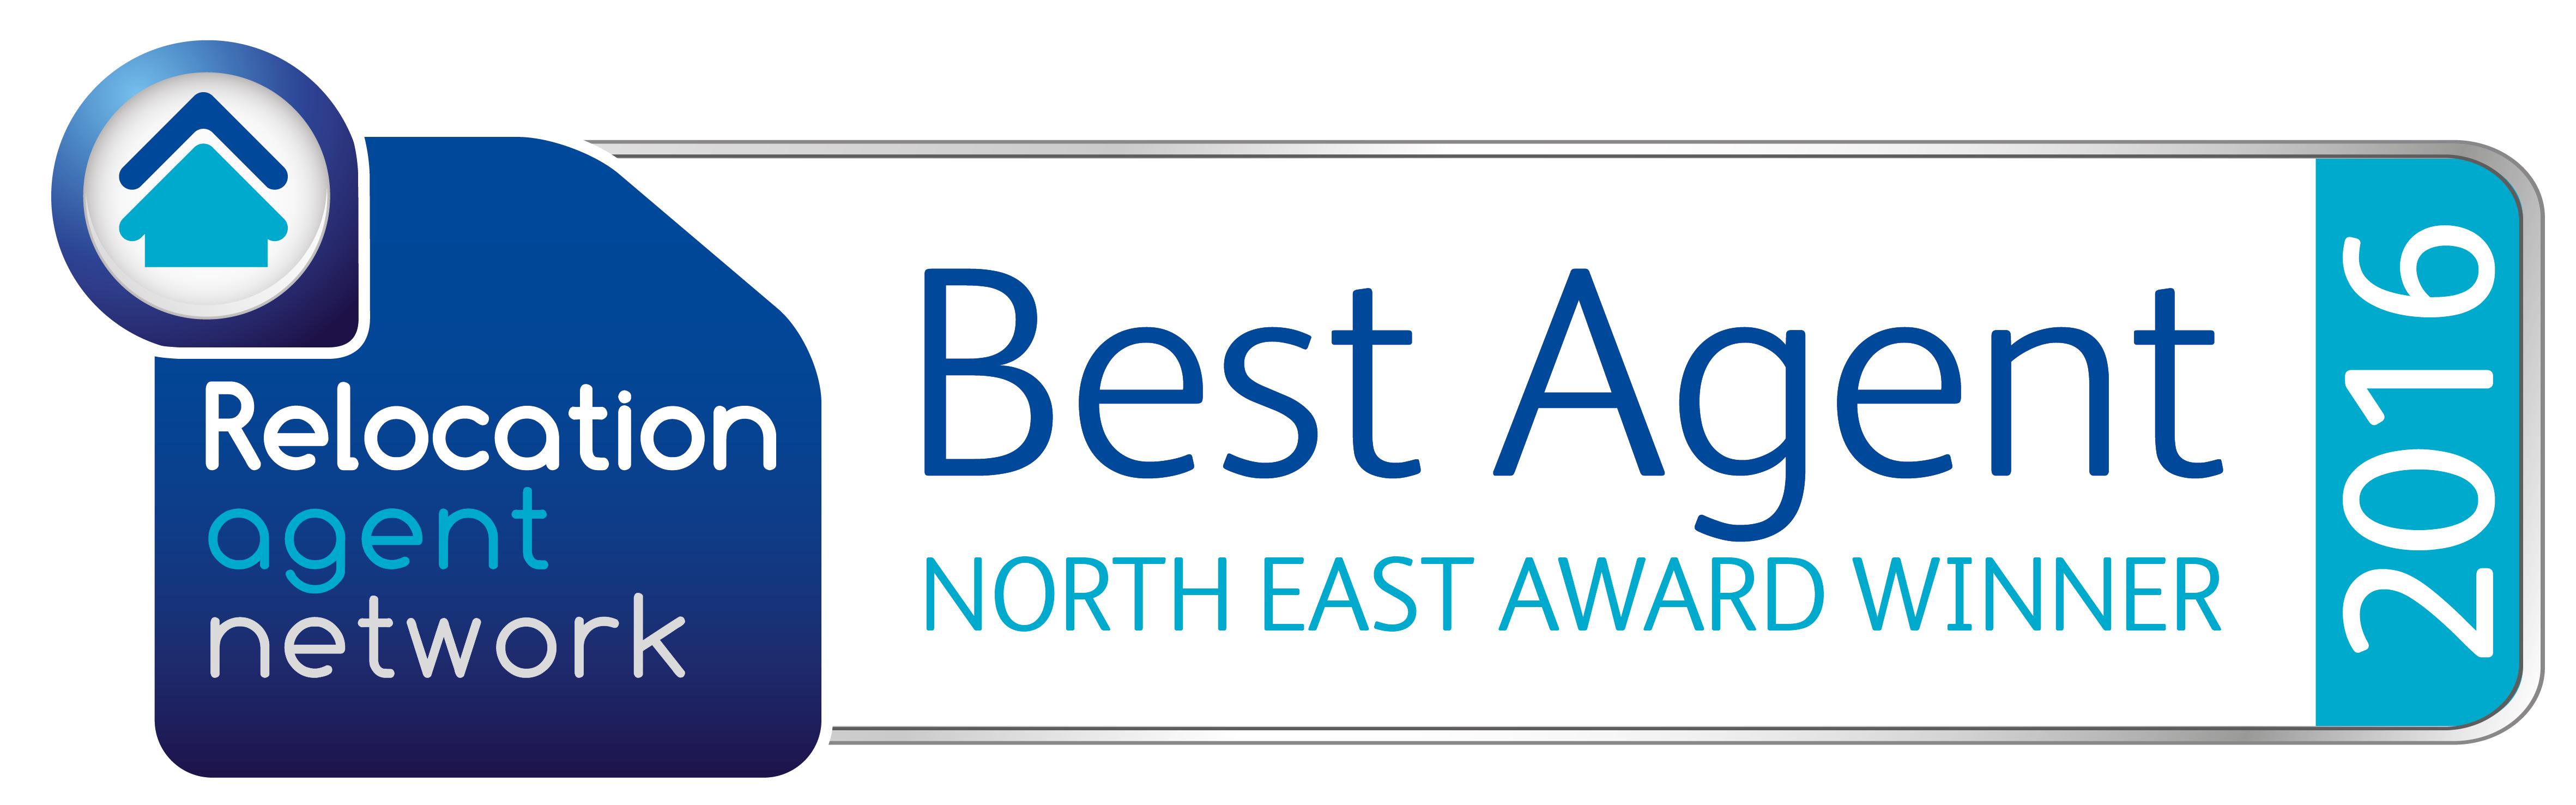 Relocation Agent Network Winner 2016